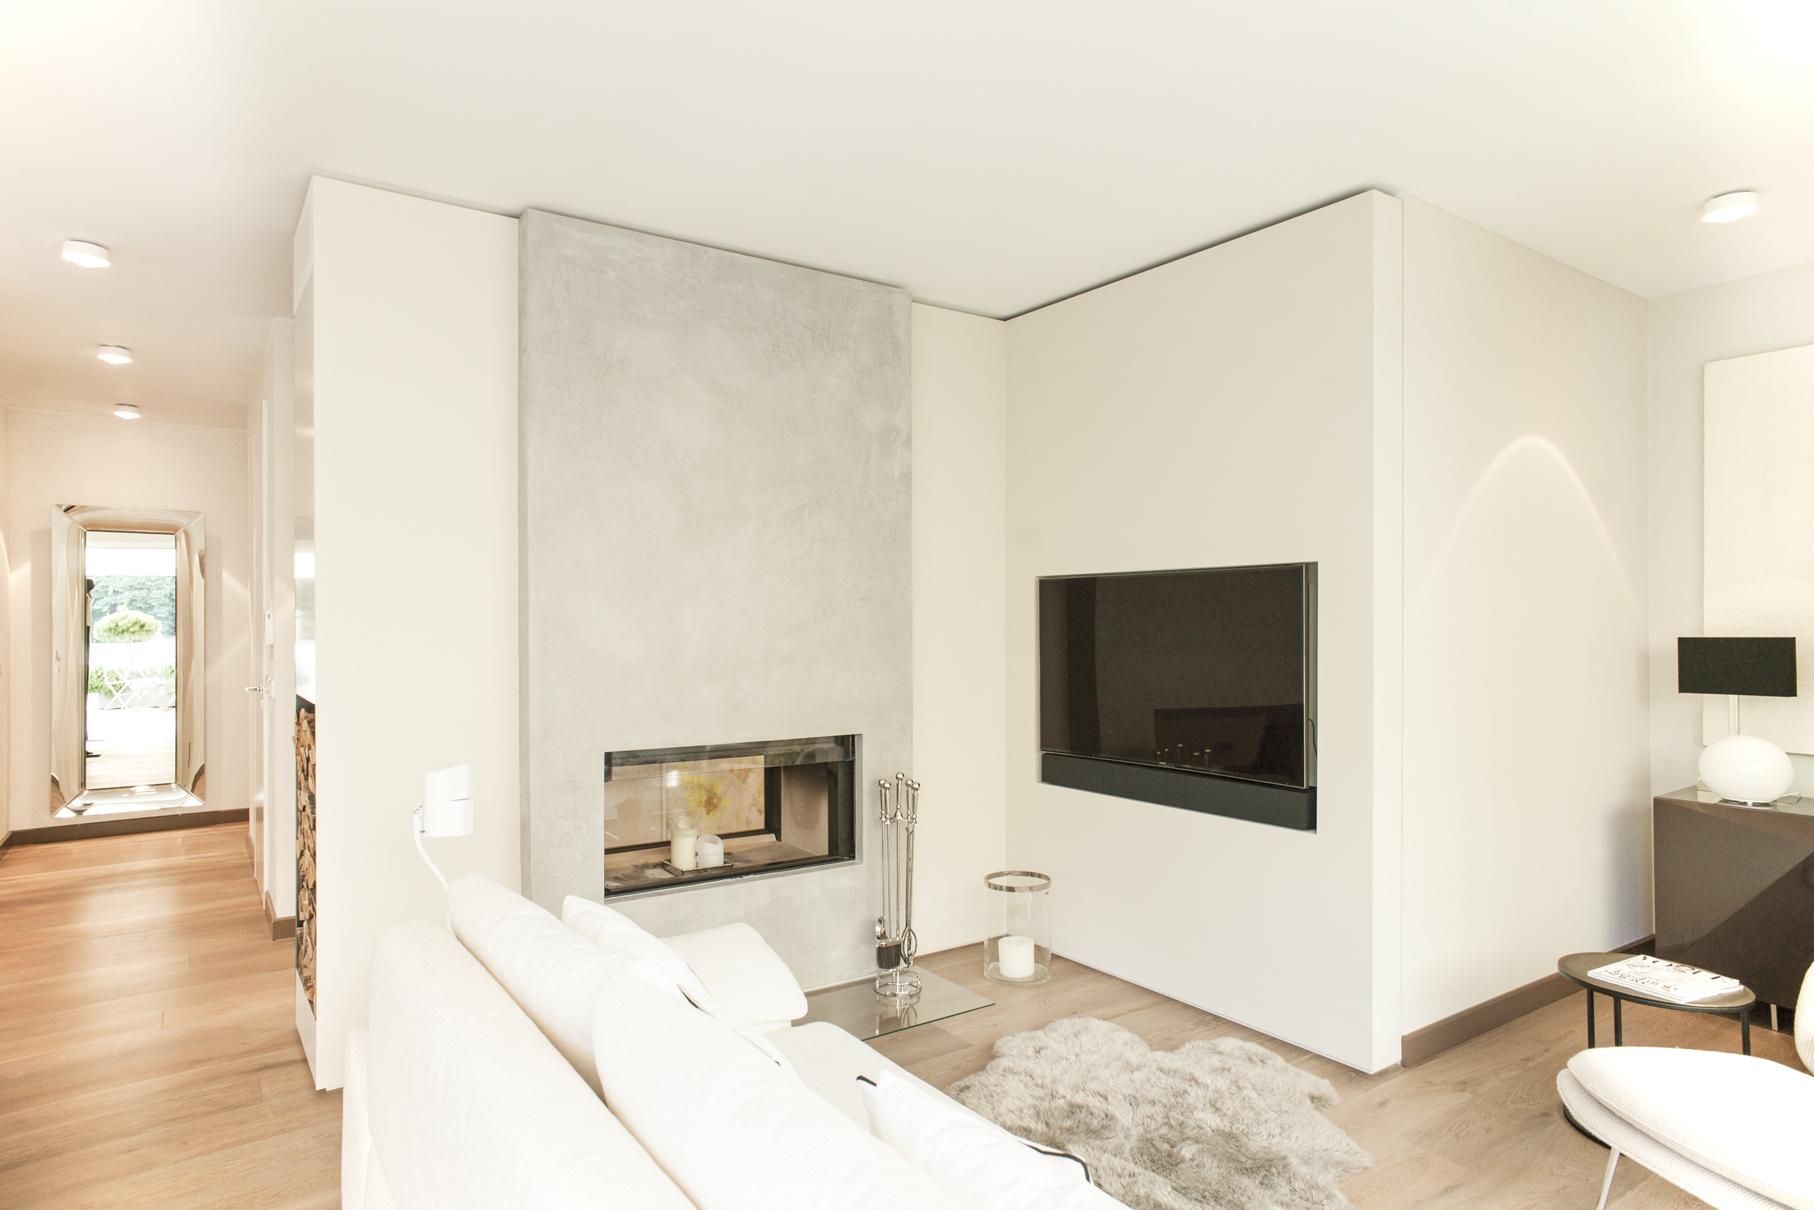 Penthouse München modern sub 02 dehmel seitz